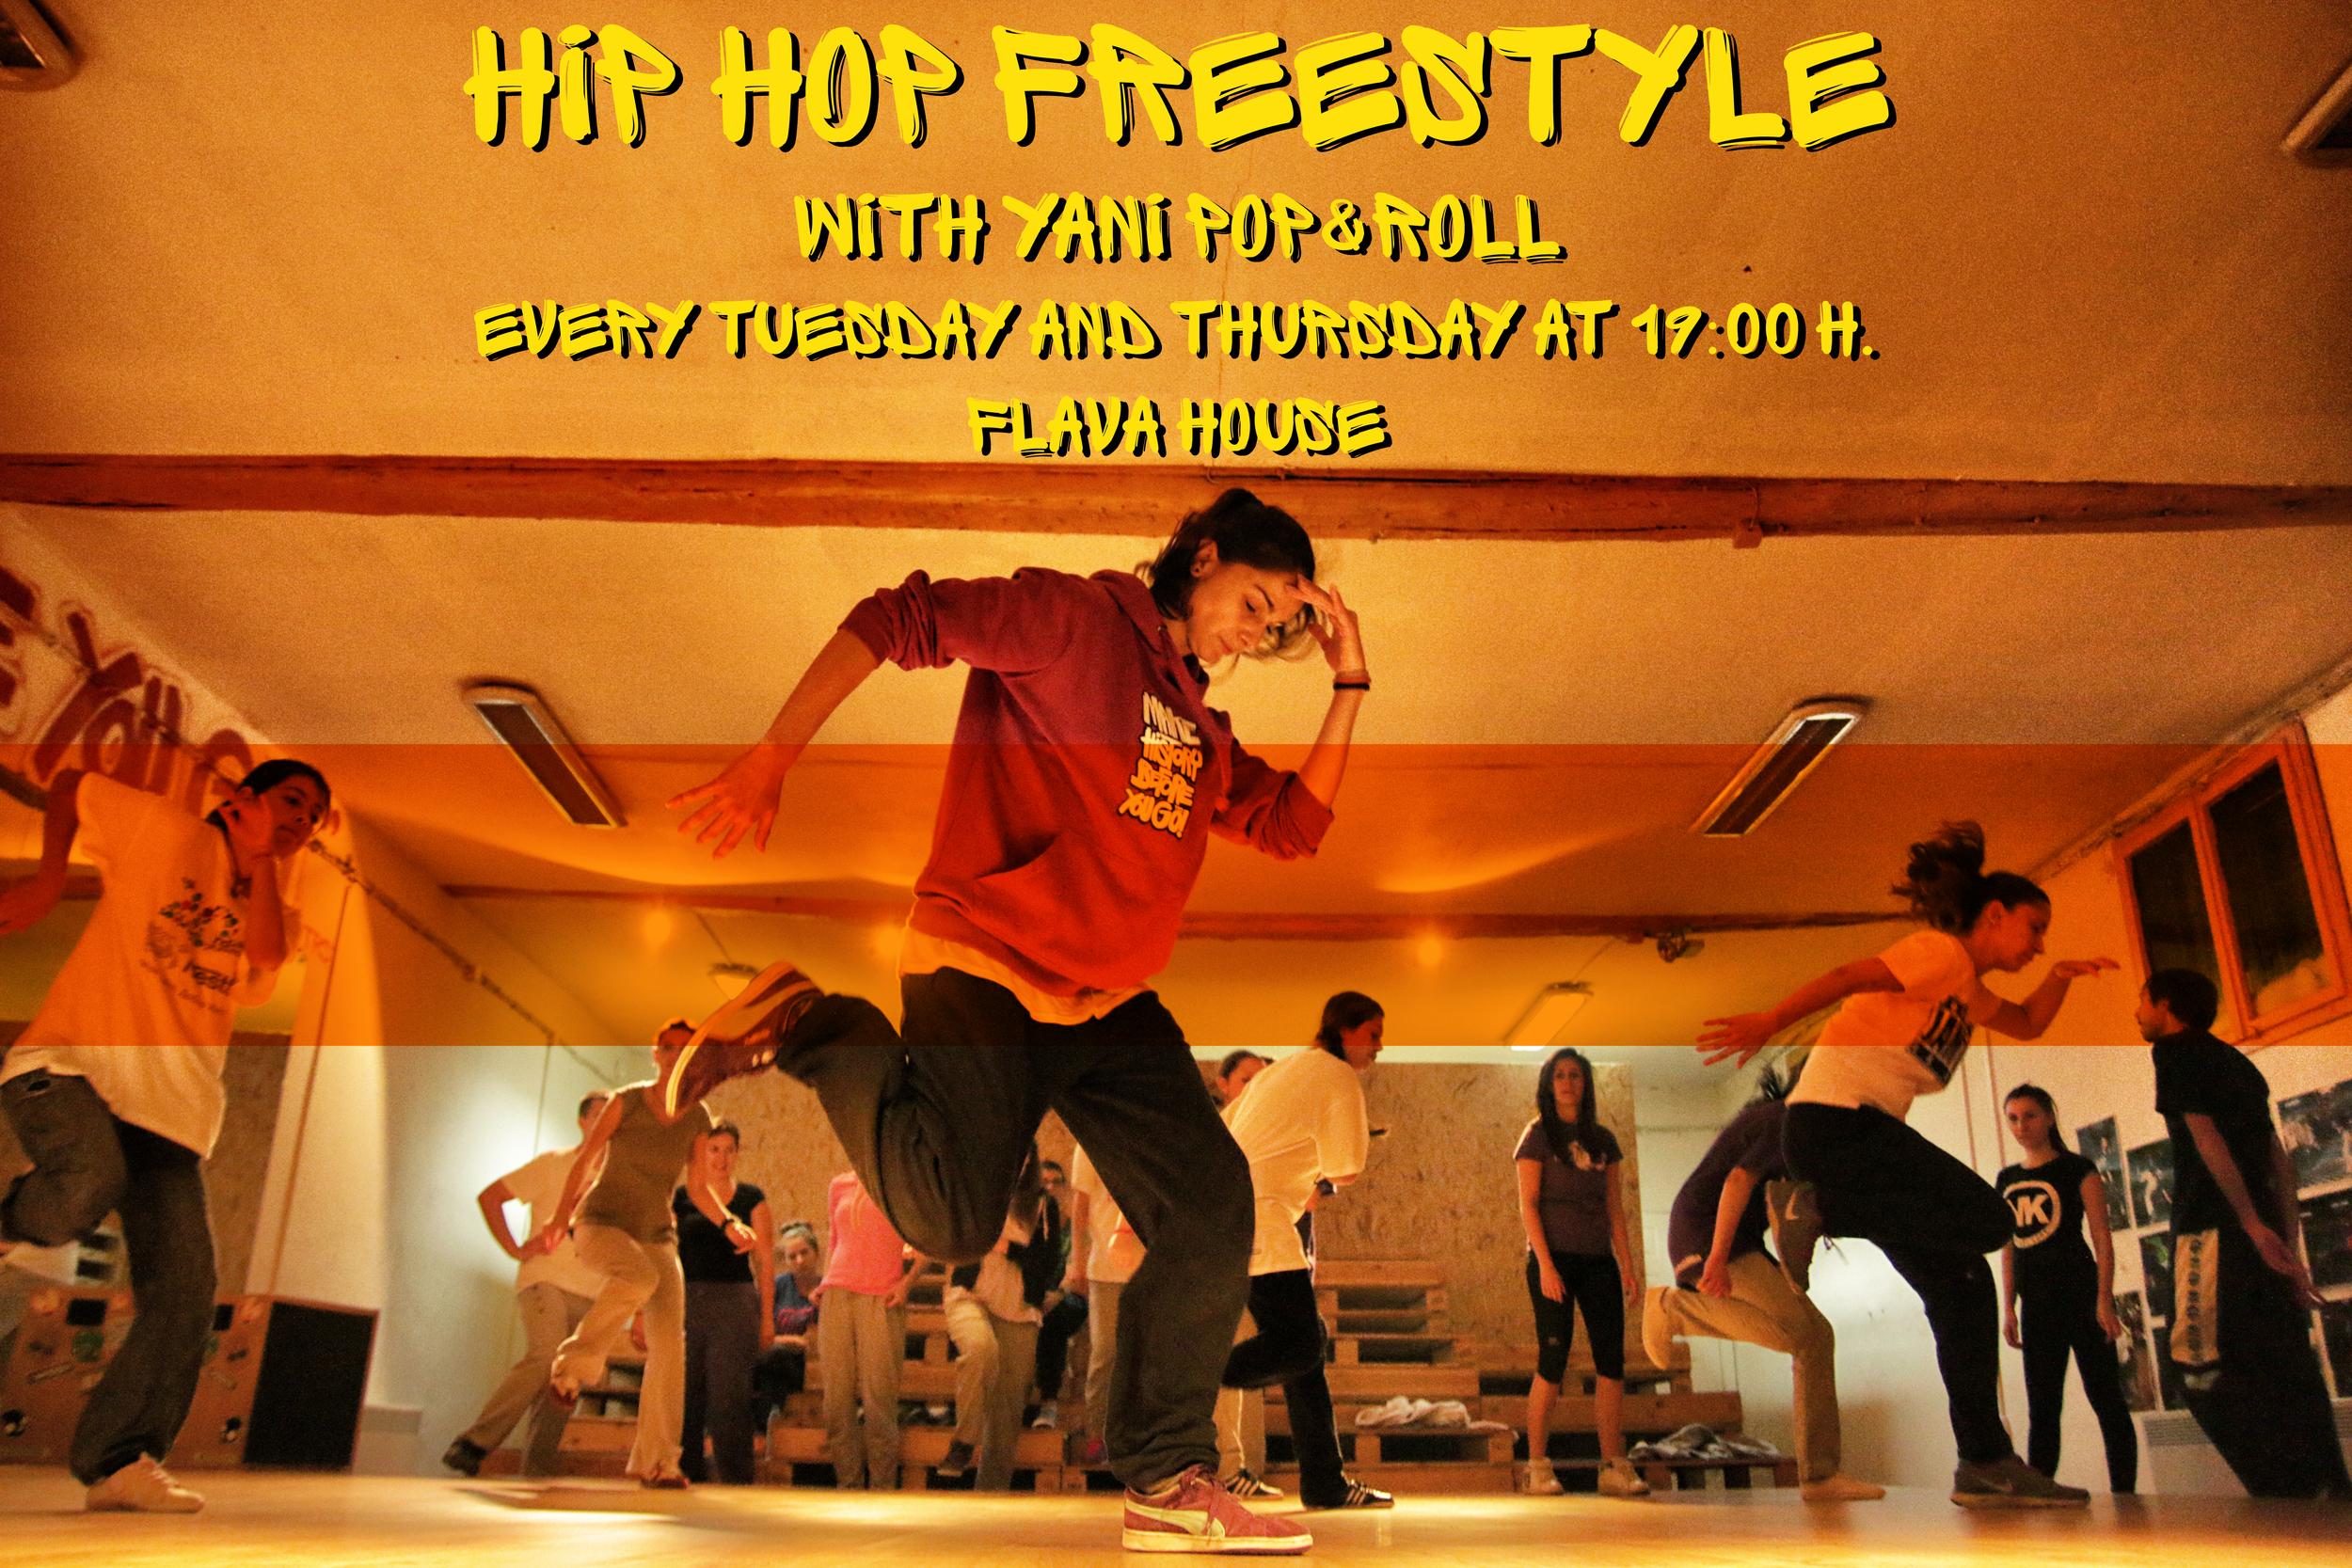 00 Snapseed Hip Hop Yani e-flyer-01.jpg